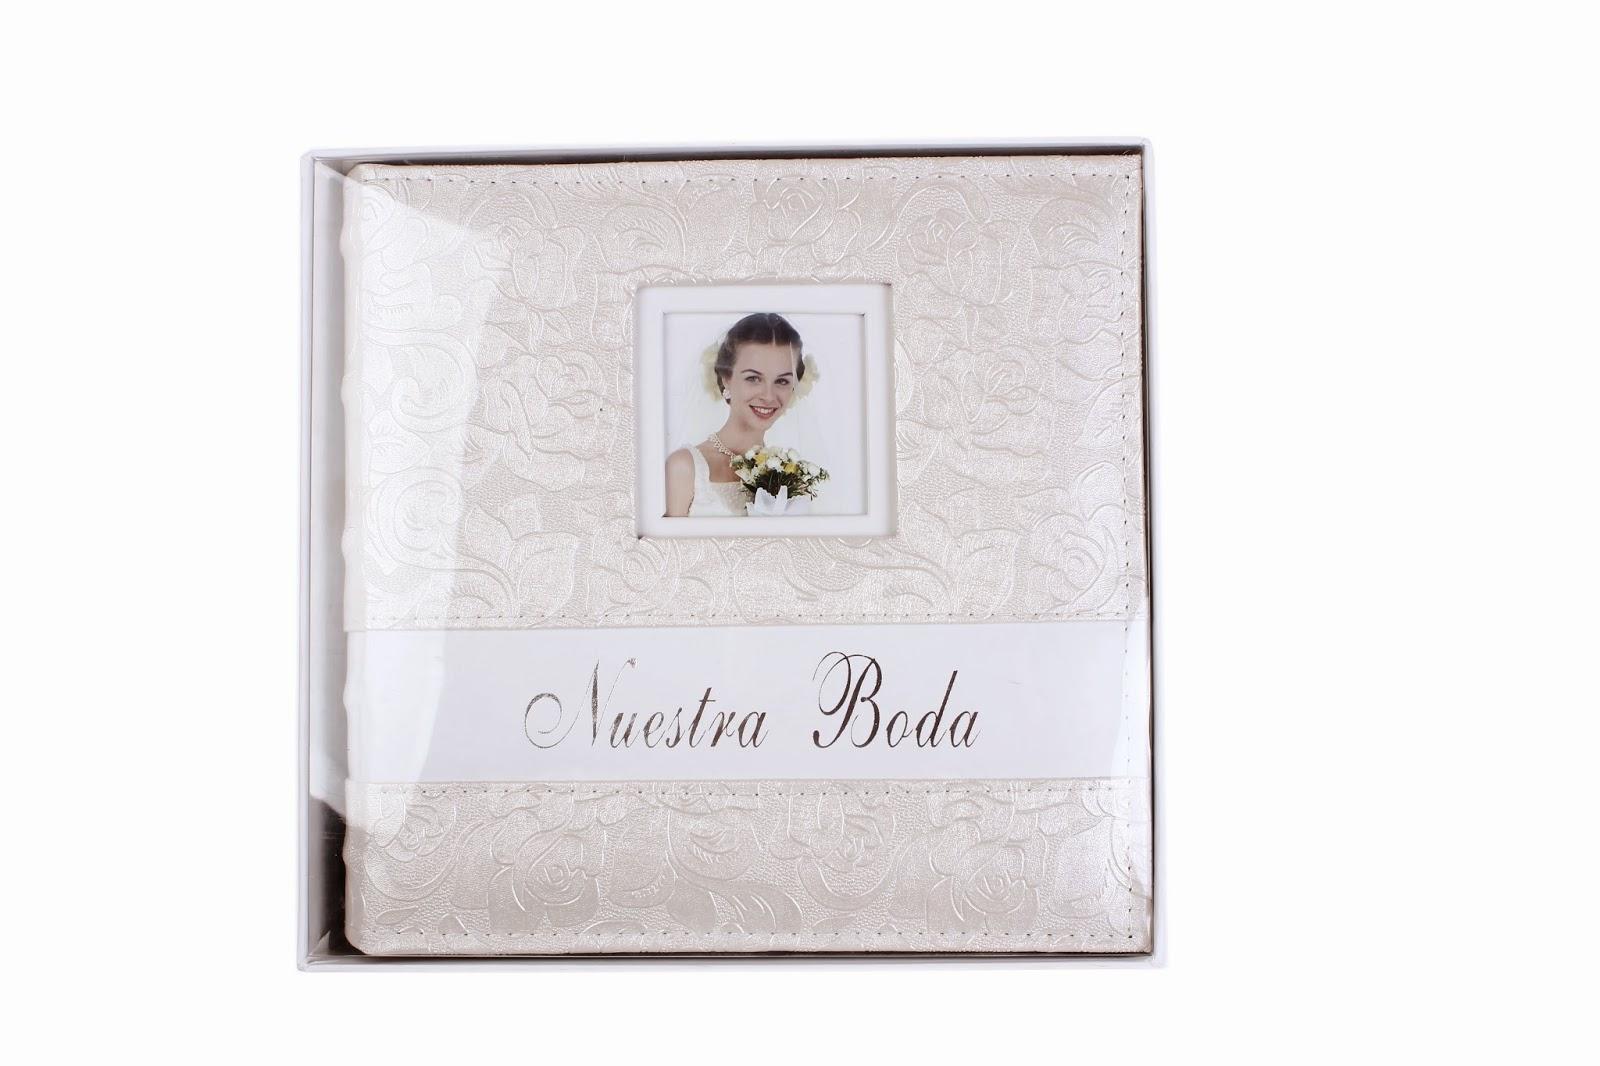 imagen detalles bodas